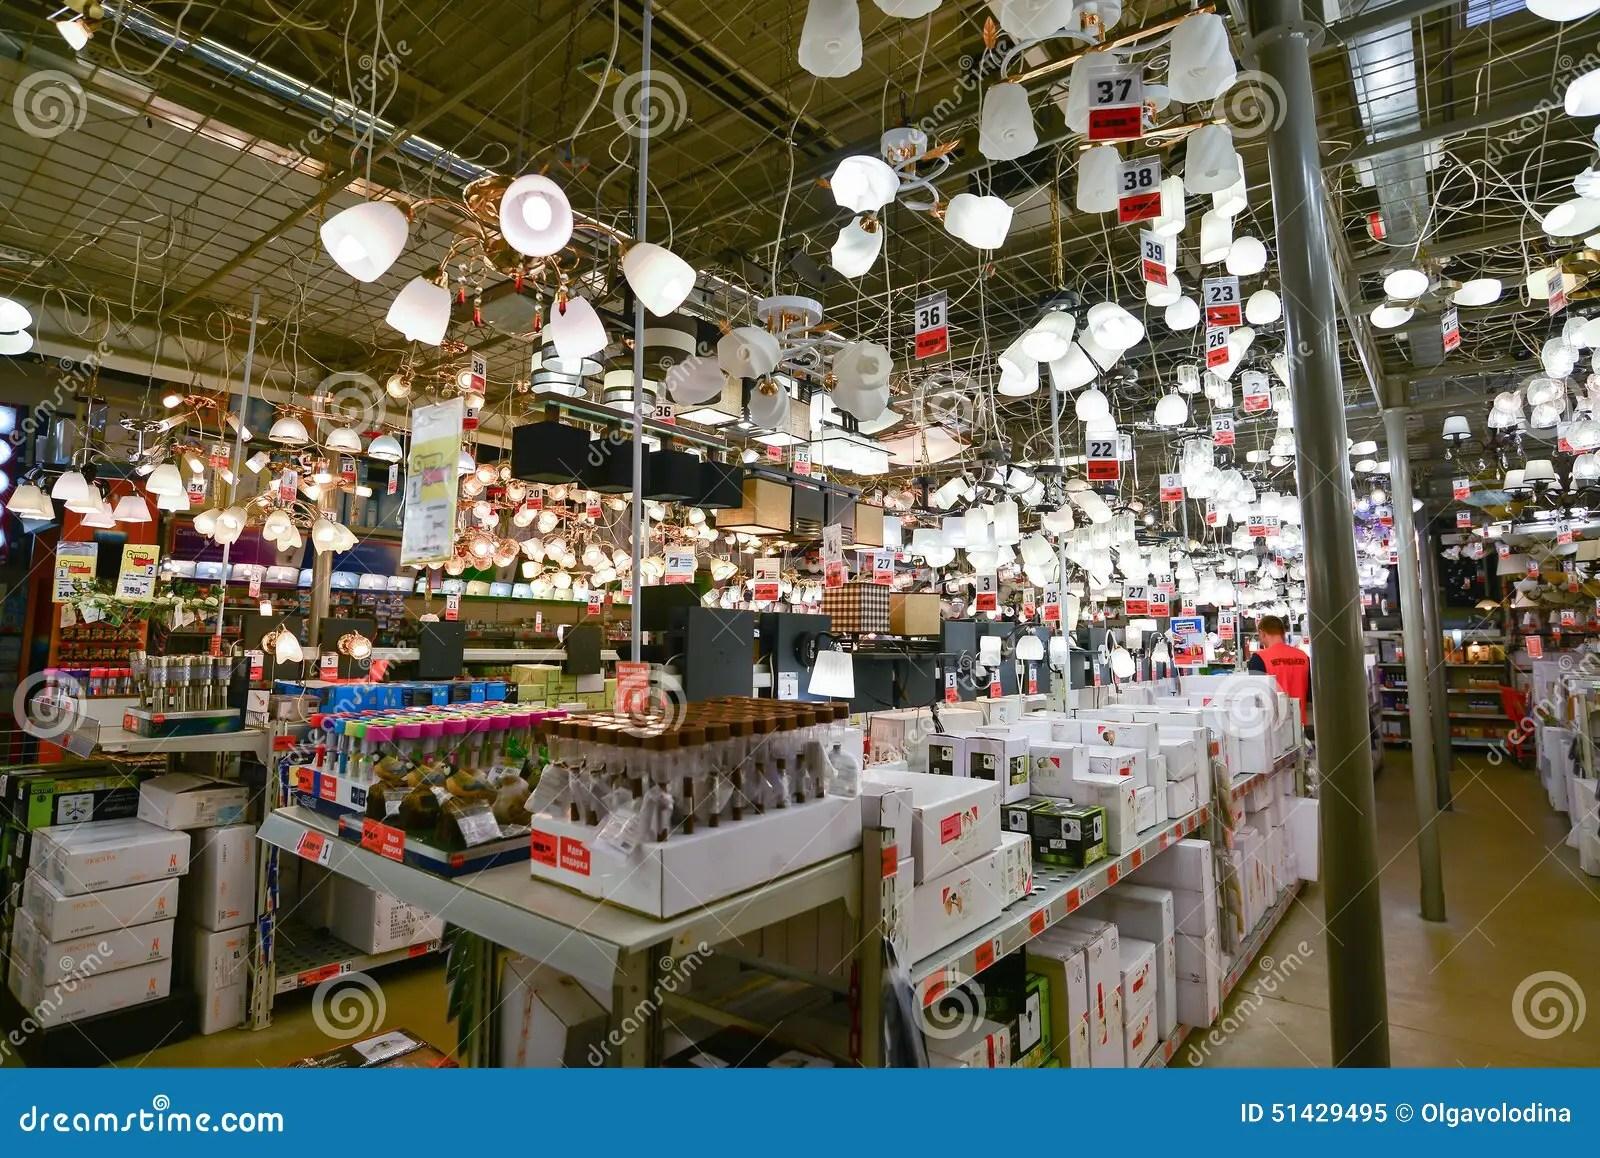 Plafoniere Quadrate Obi : Illuminazione obi giardino leroy merlin 20 grande